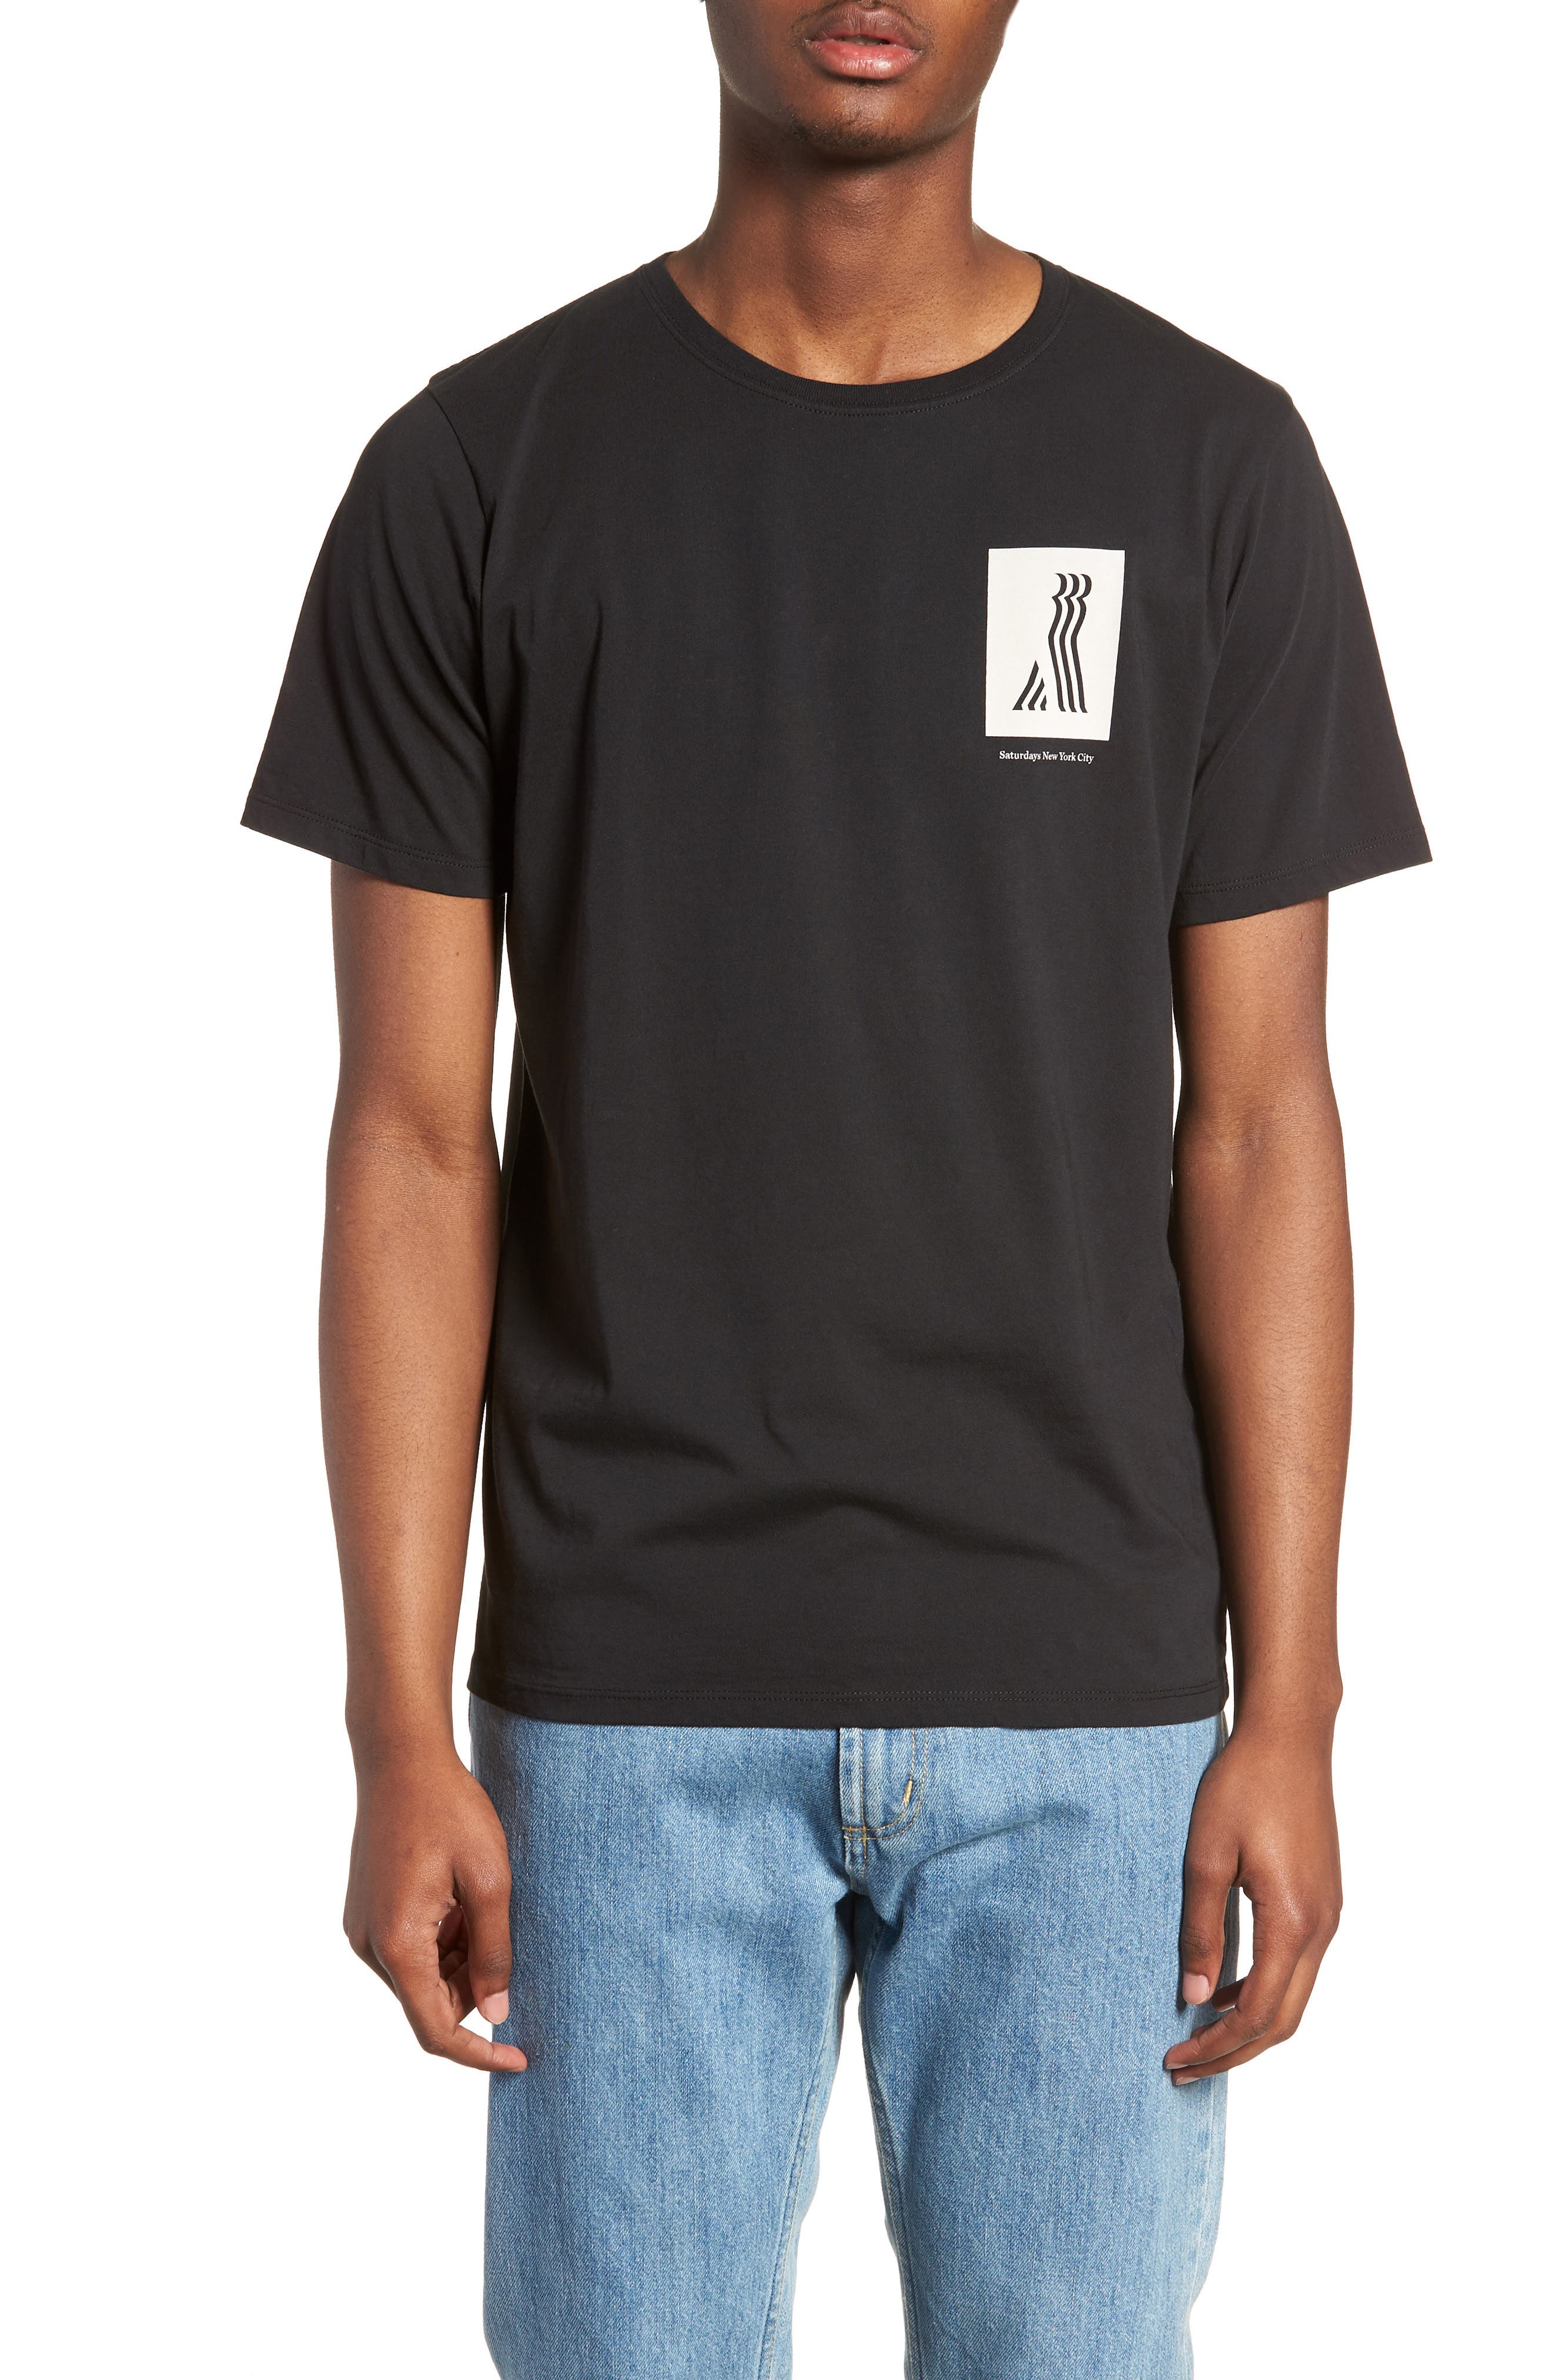 Walking Man T-Shirt,                             Main thumbnail 1, color,                             BLACK